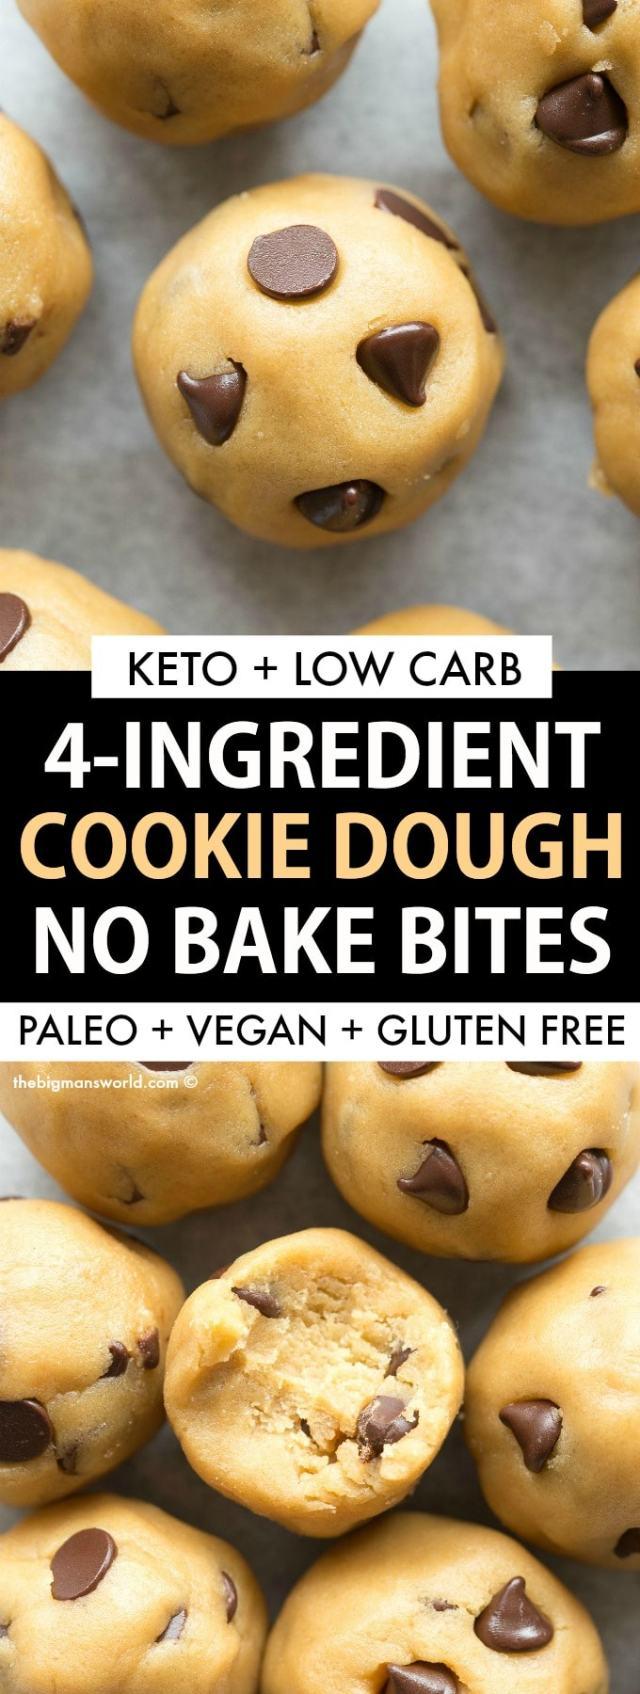 Paleo Vegan Keto No Bake Cookie Dough Bites Recipe